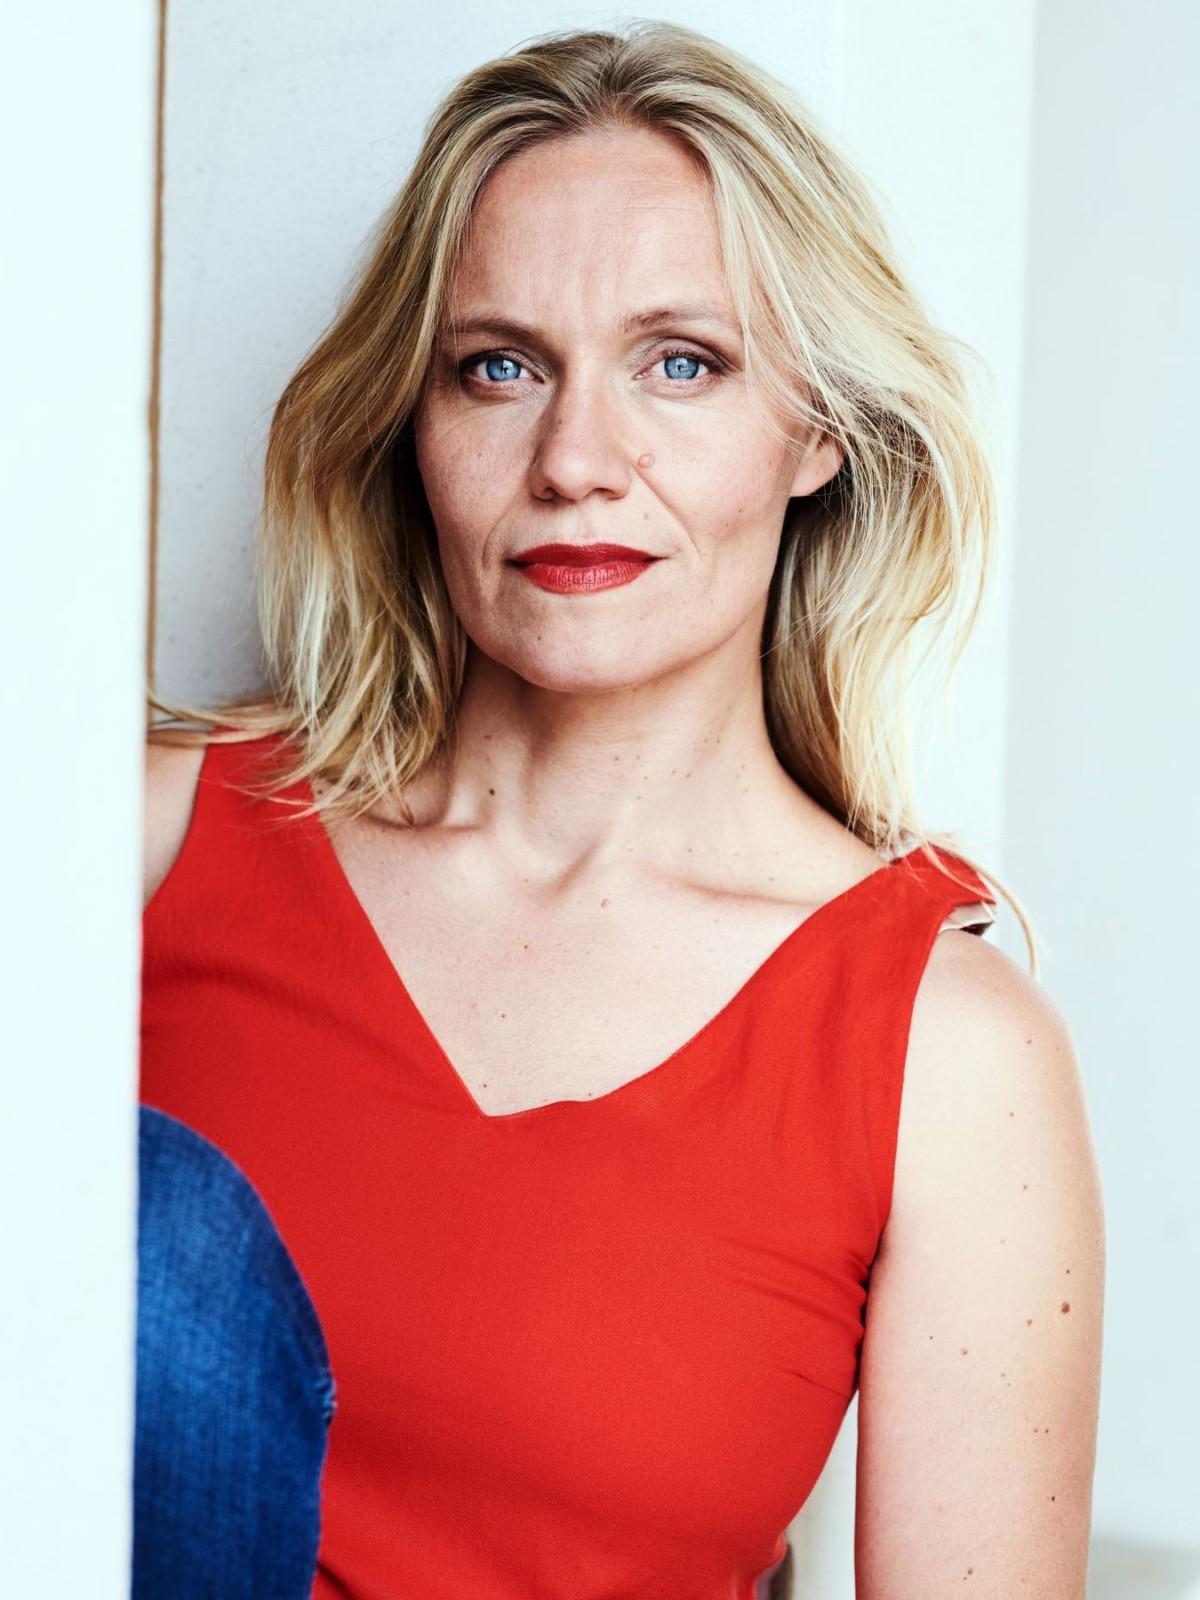 Meri Koivisto, Actors Agency Osman, Schauspielagentur